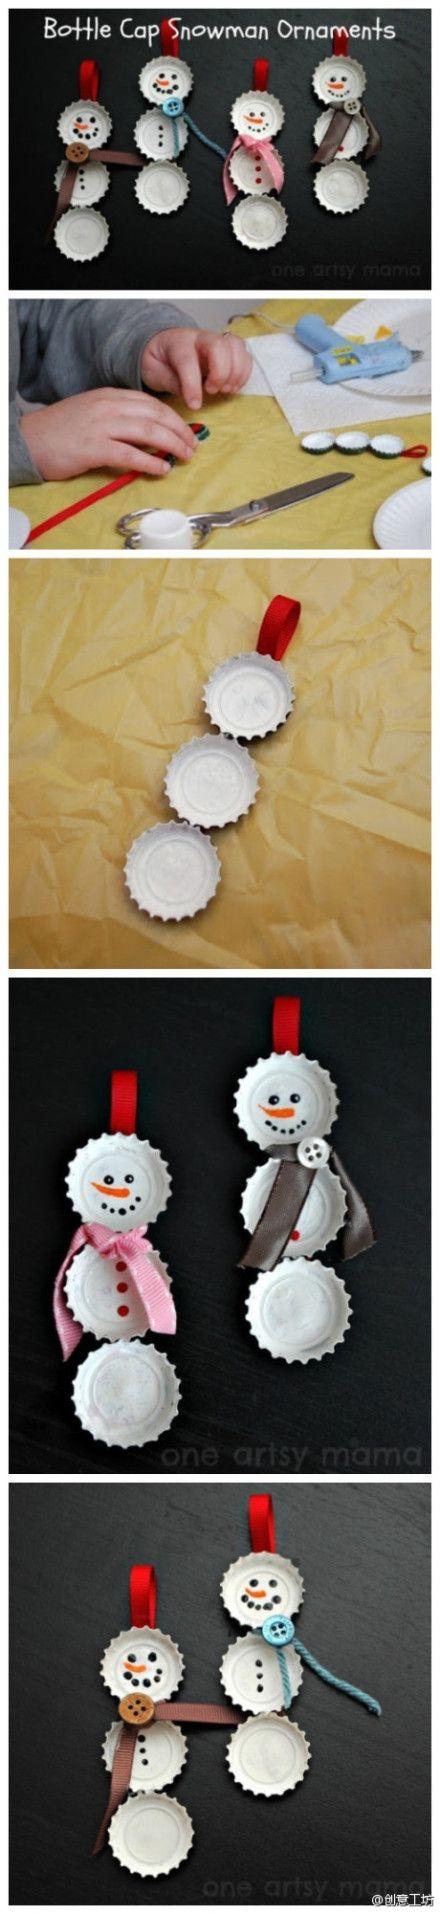 DIY Bottle Cap Snowman by diyforever